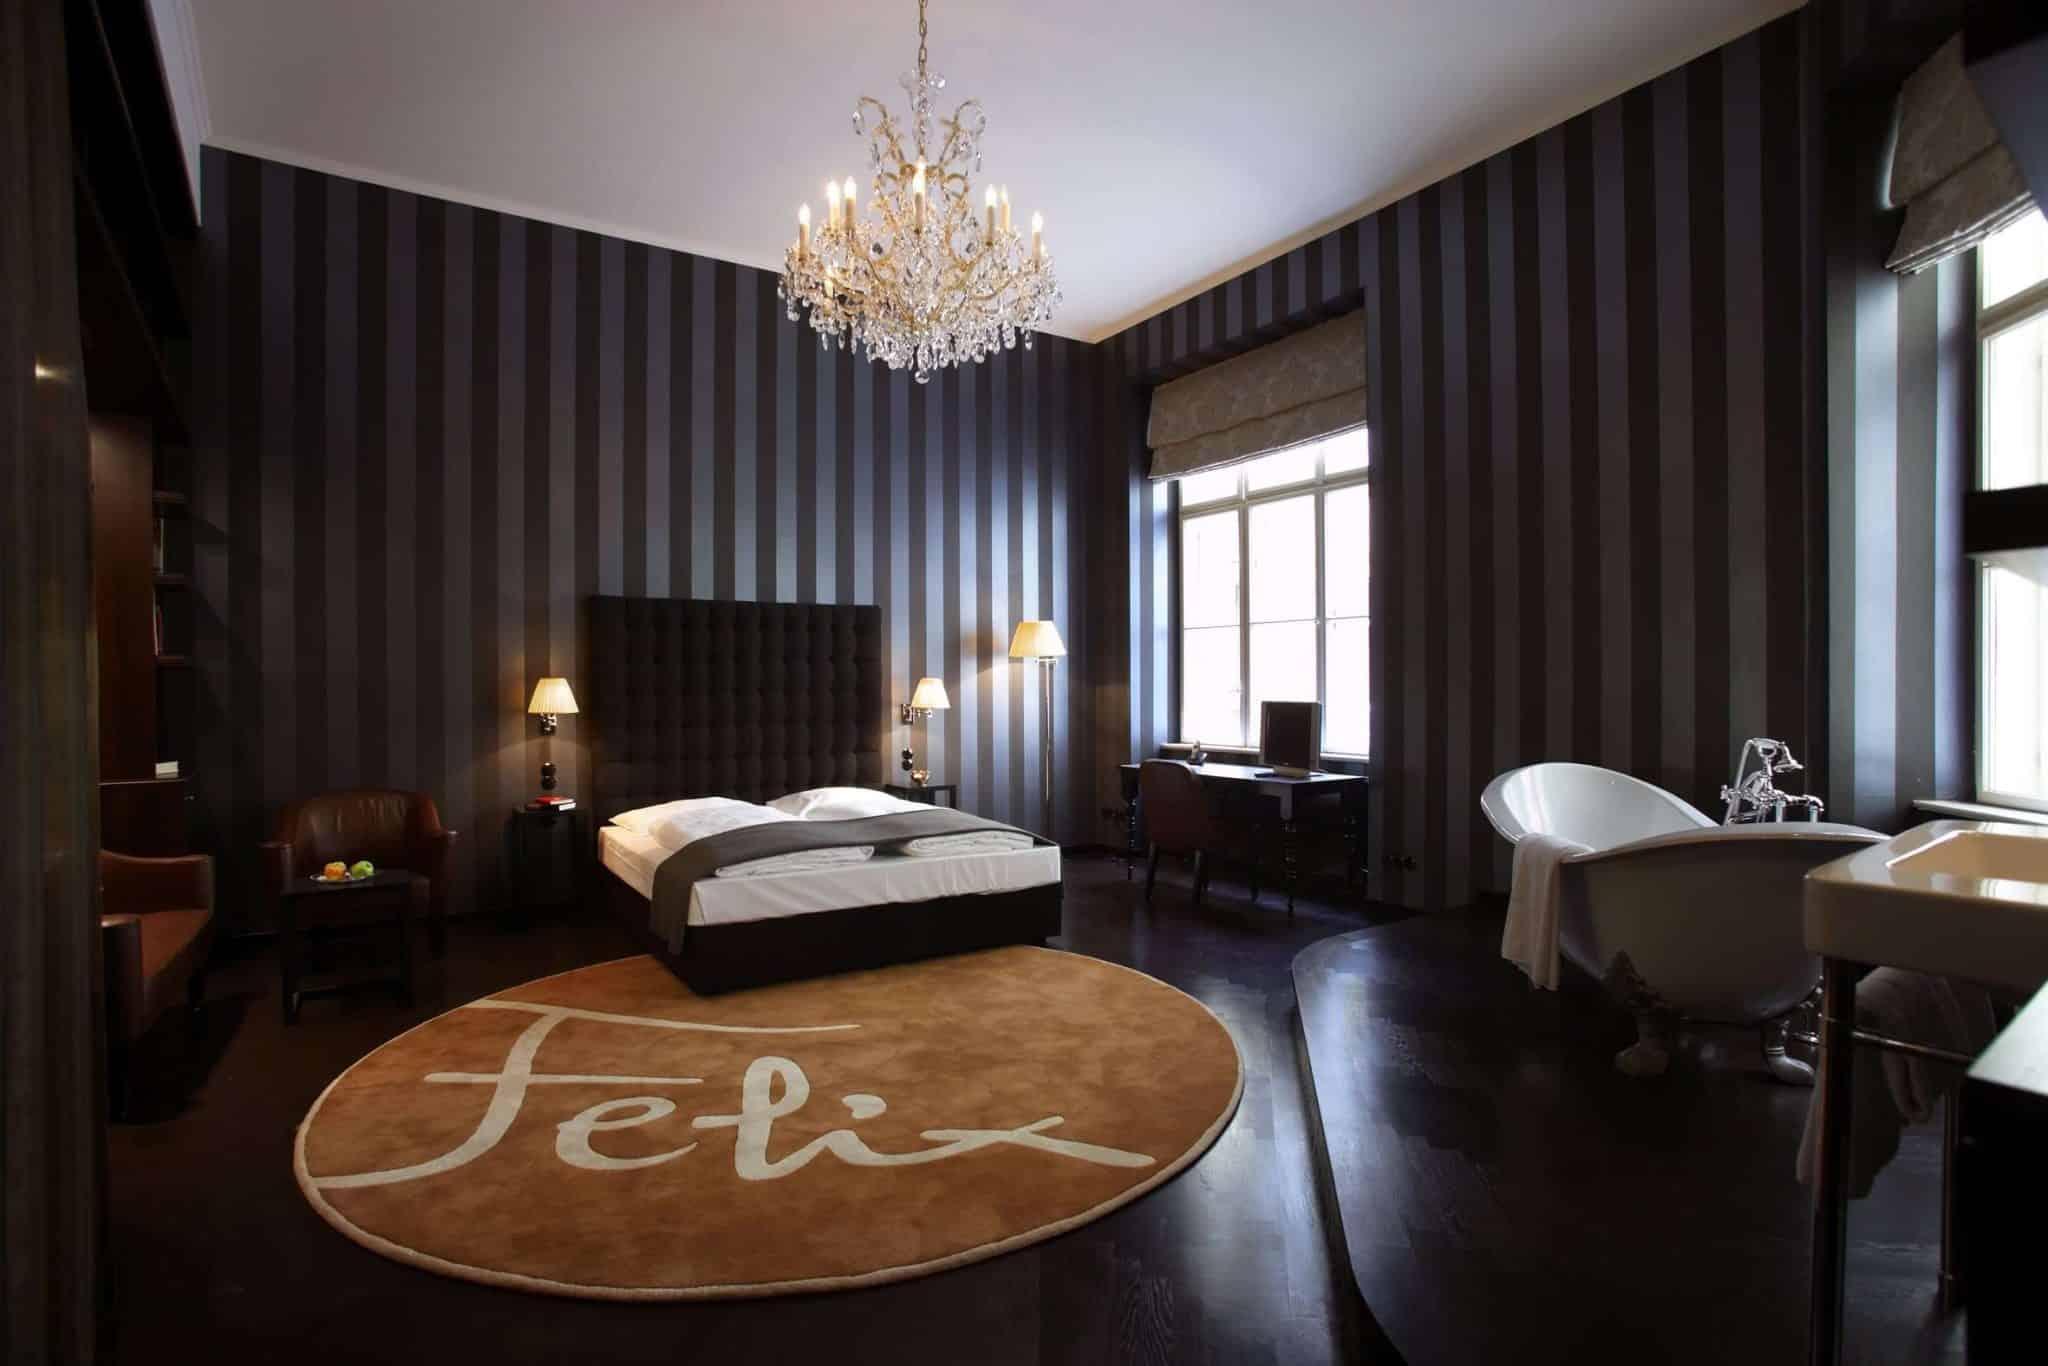 Felix Suite_Matteo Thun_Bed and bath_landscape_Hotel Altstadt Vienna_Medium Resolution